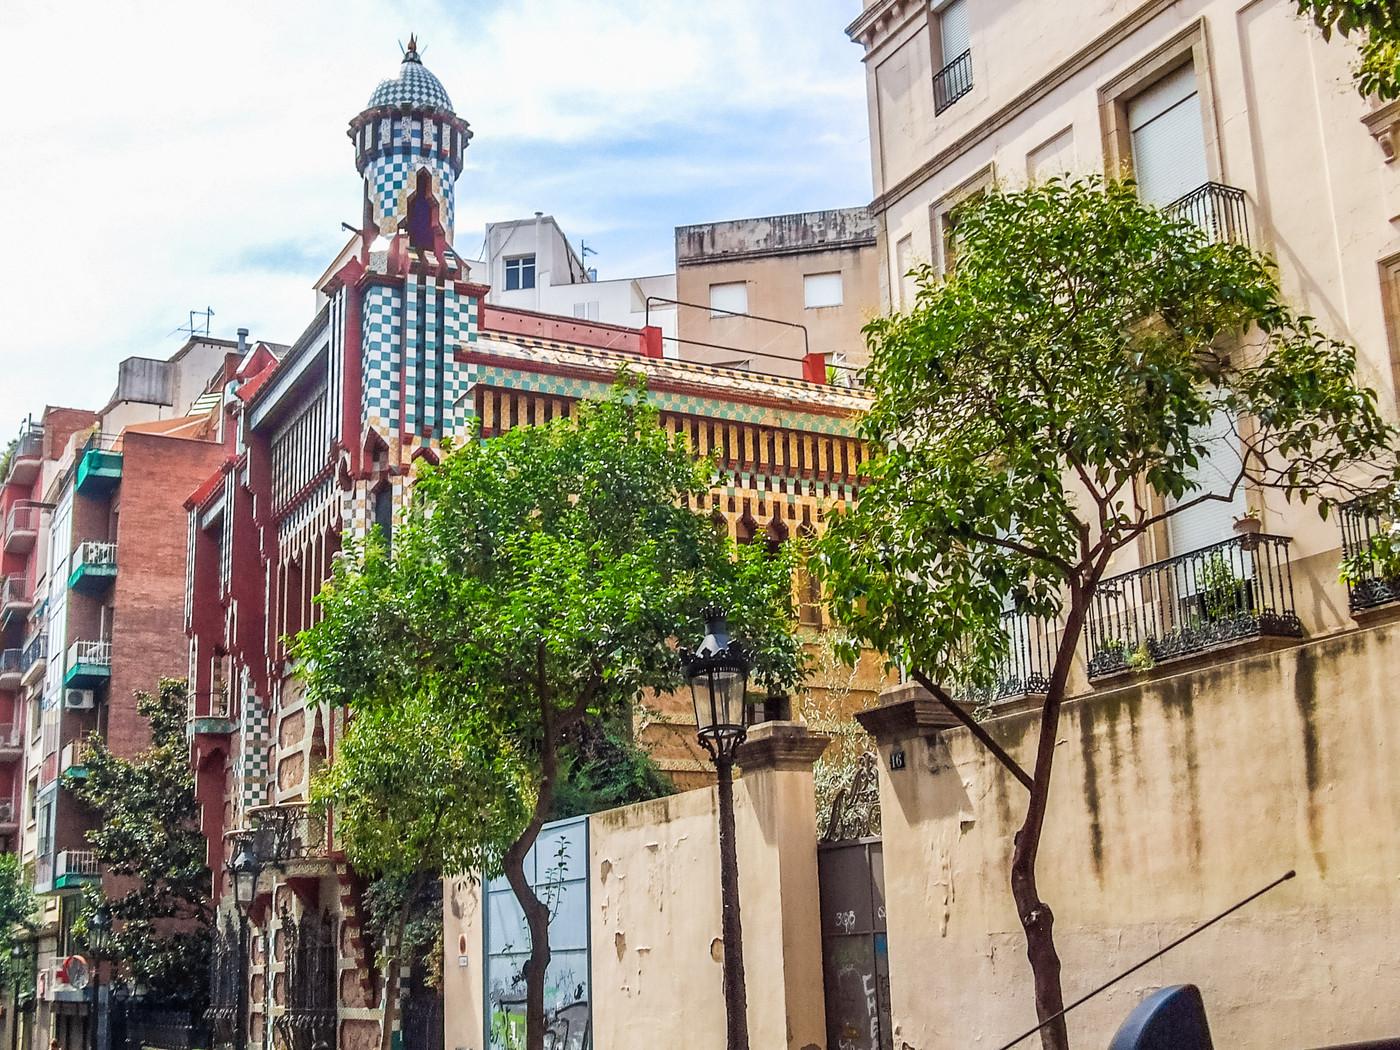 Casa Vicens Gaudí, Barcelona